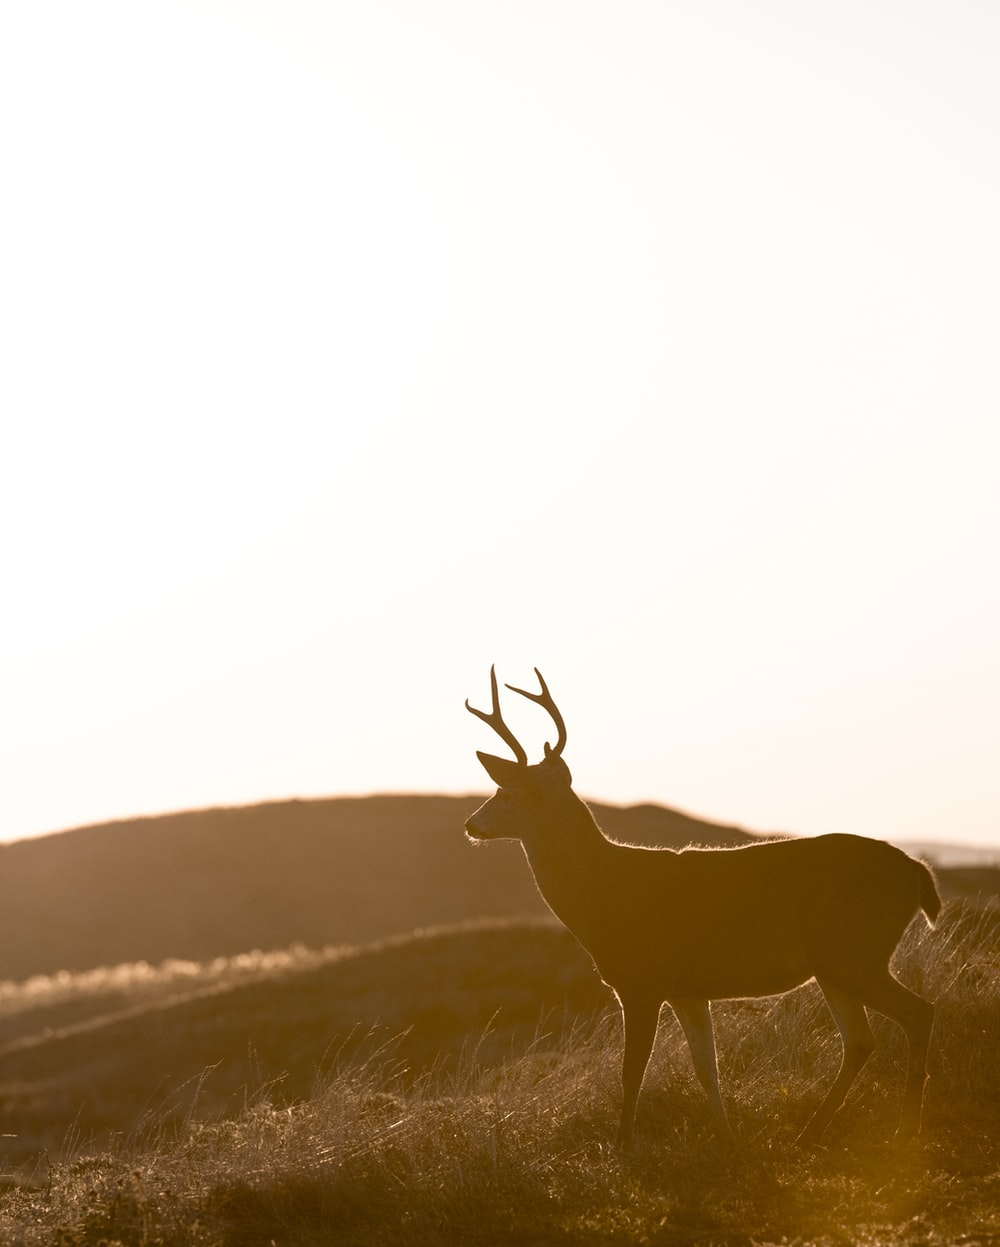 silhouette of deer standing on grass field